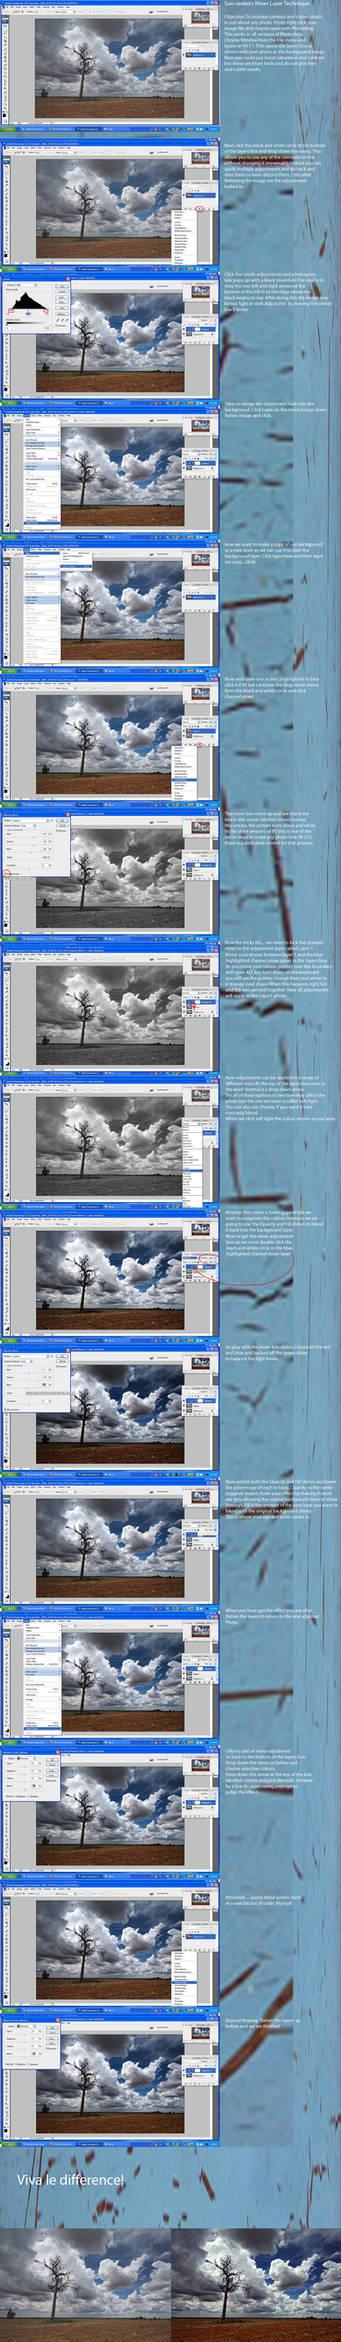 Photoshop Layer adjust Tute